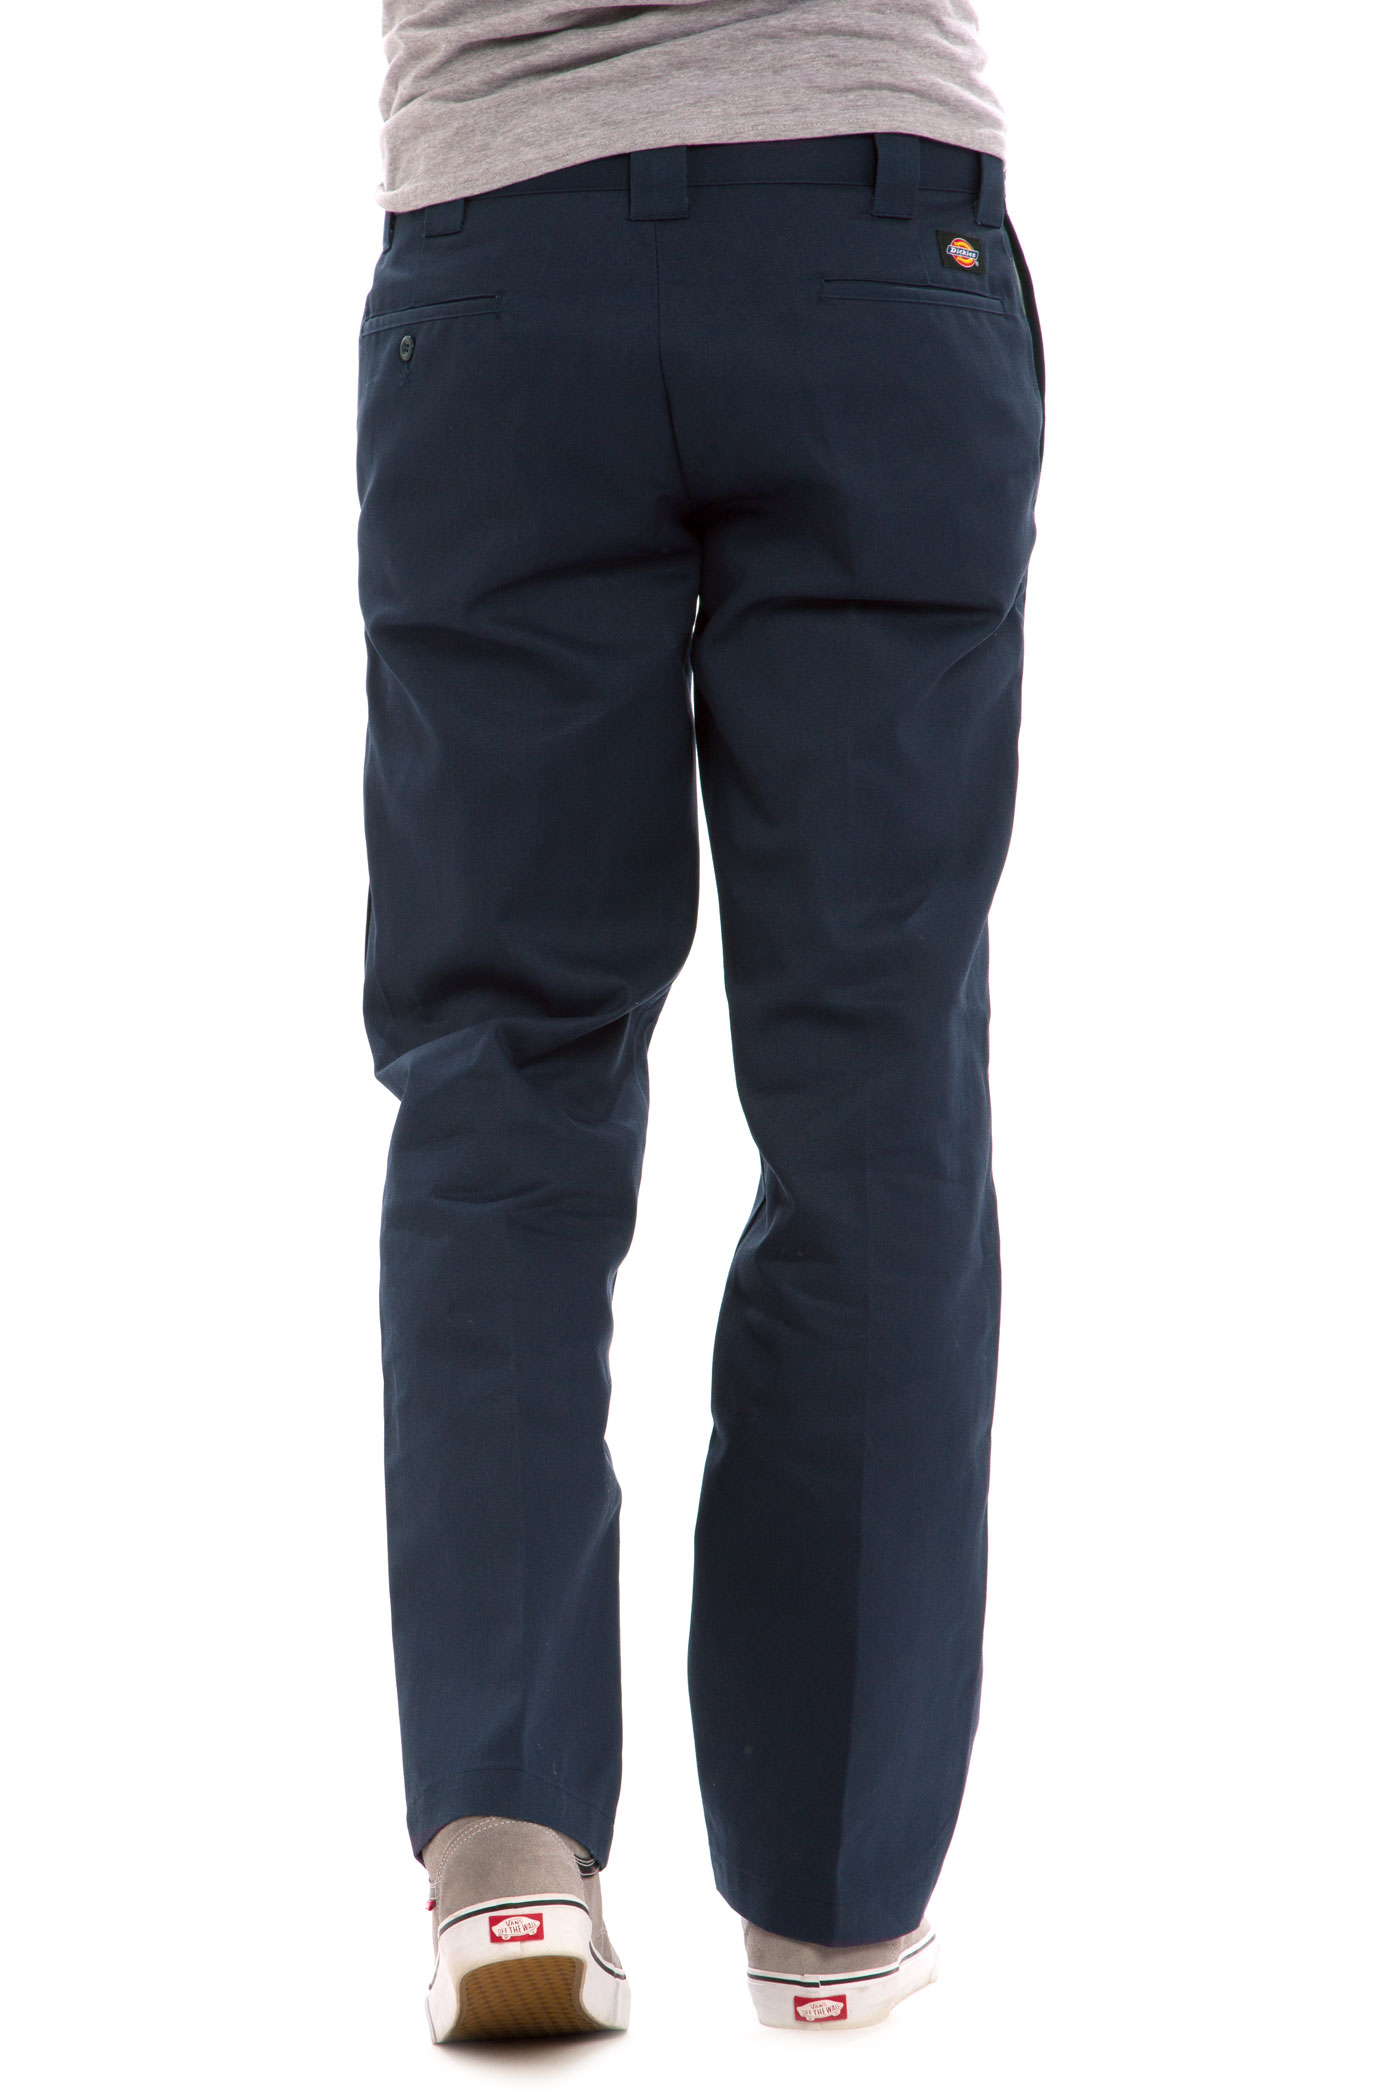 Slim Straight Blue 873 Workpant Dickies Pantalonsnavy VpqSMGUz